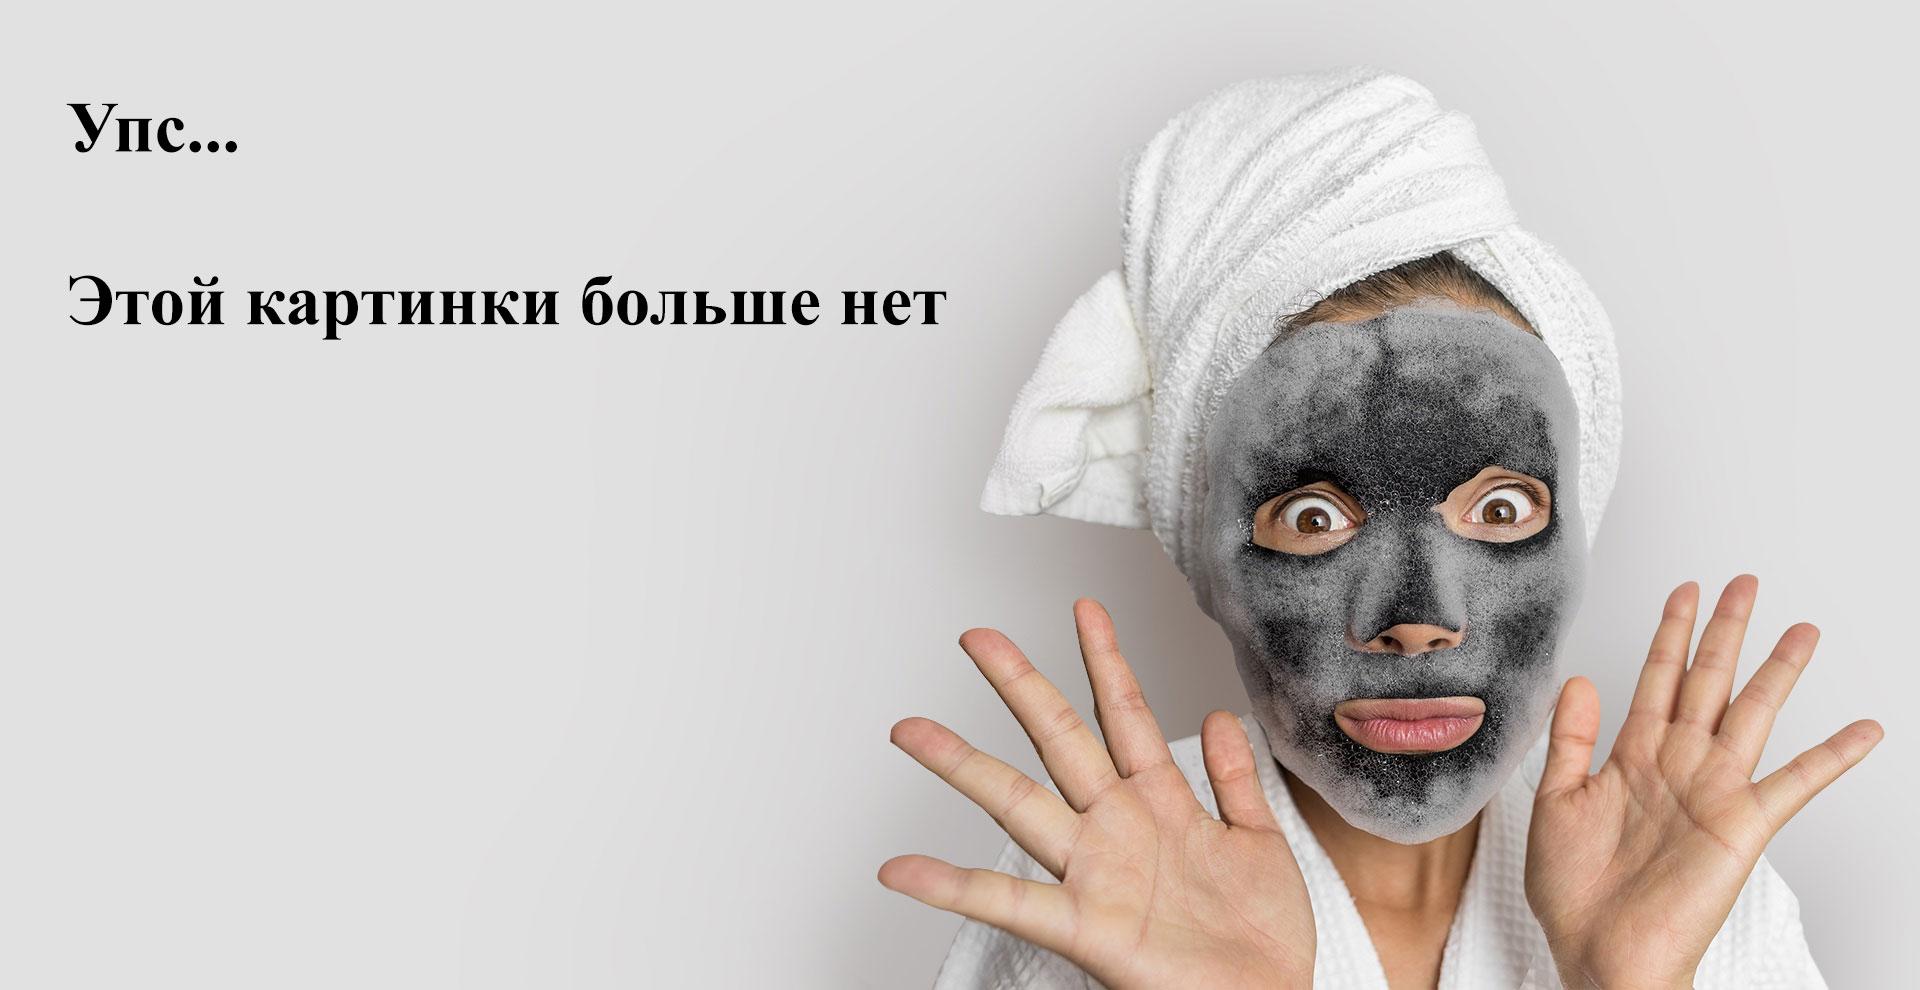 Patrisa Nail, Гель-лак «Элегия» №513, Гелеос